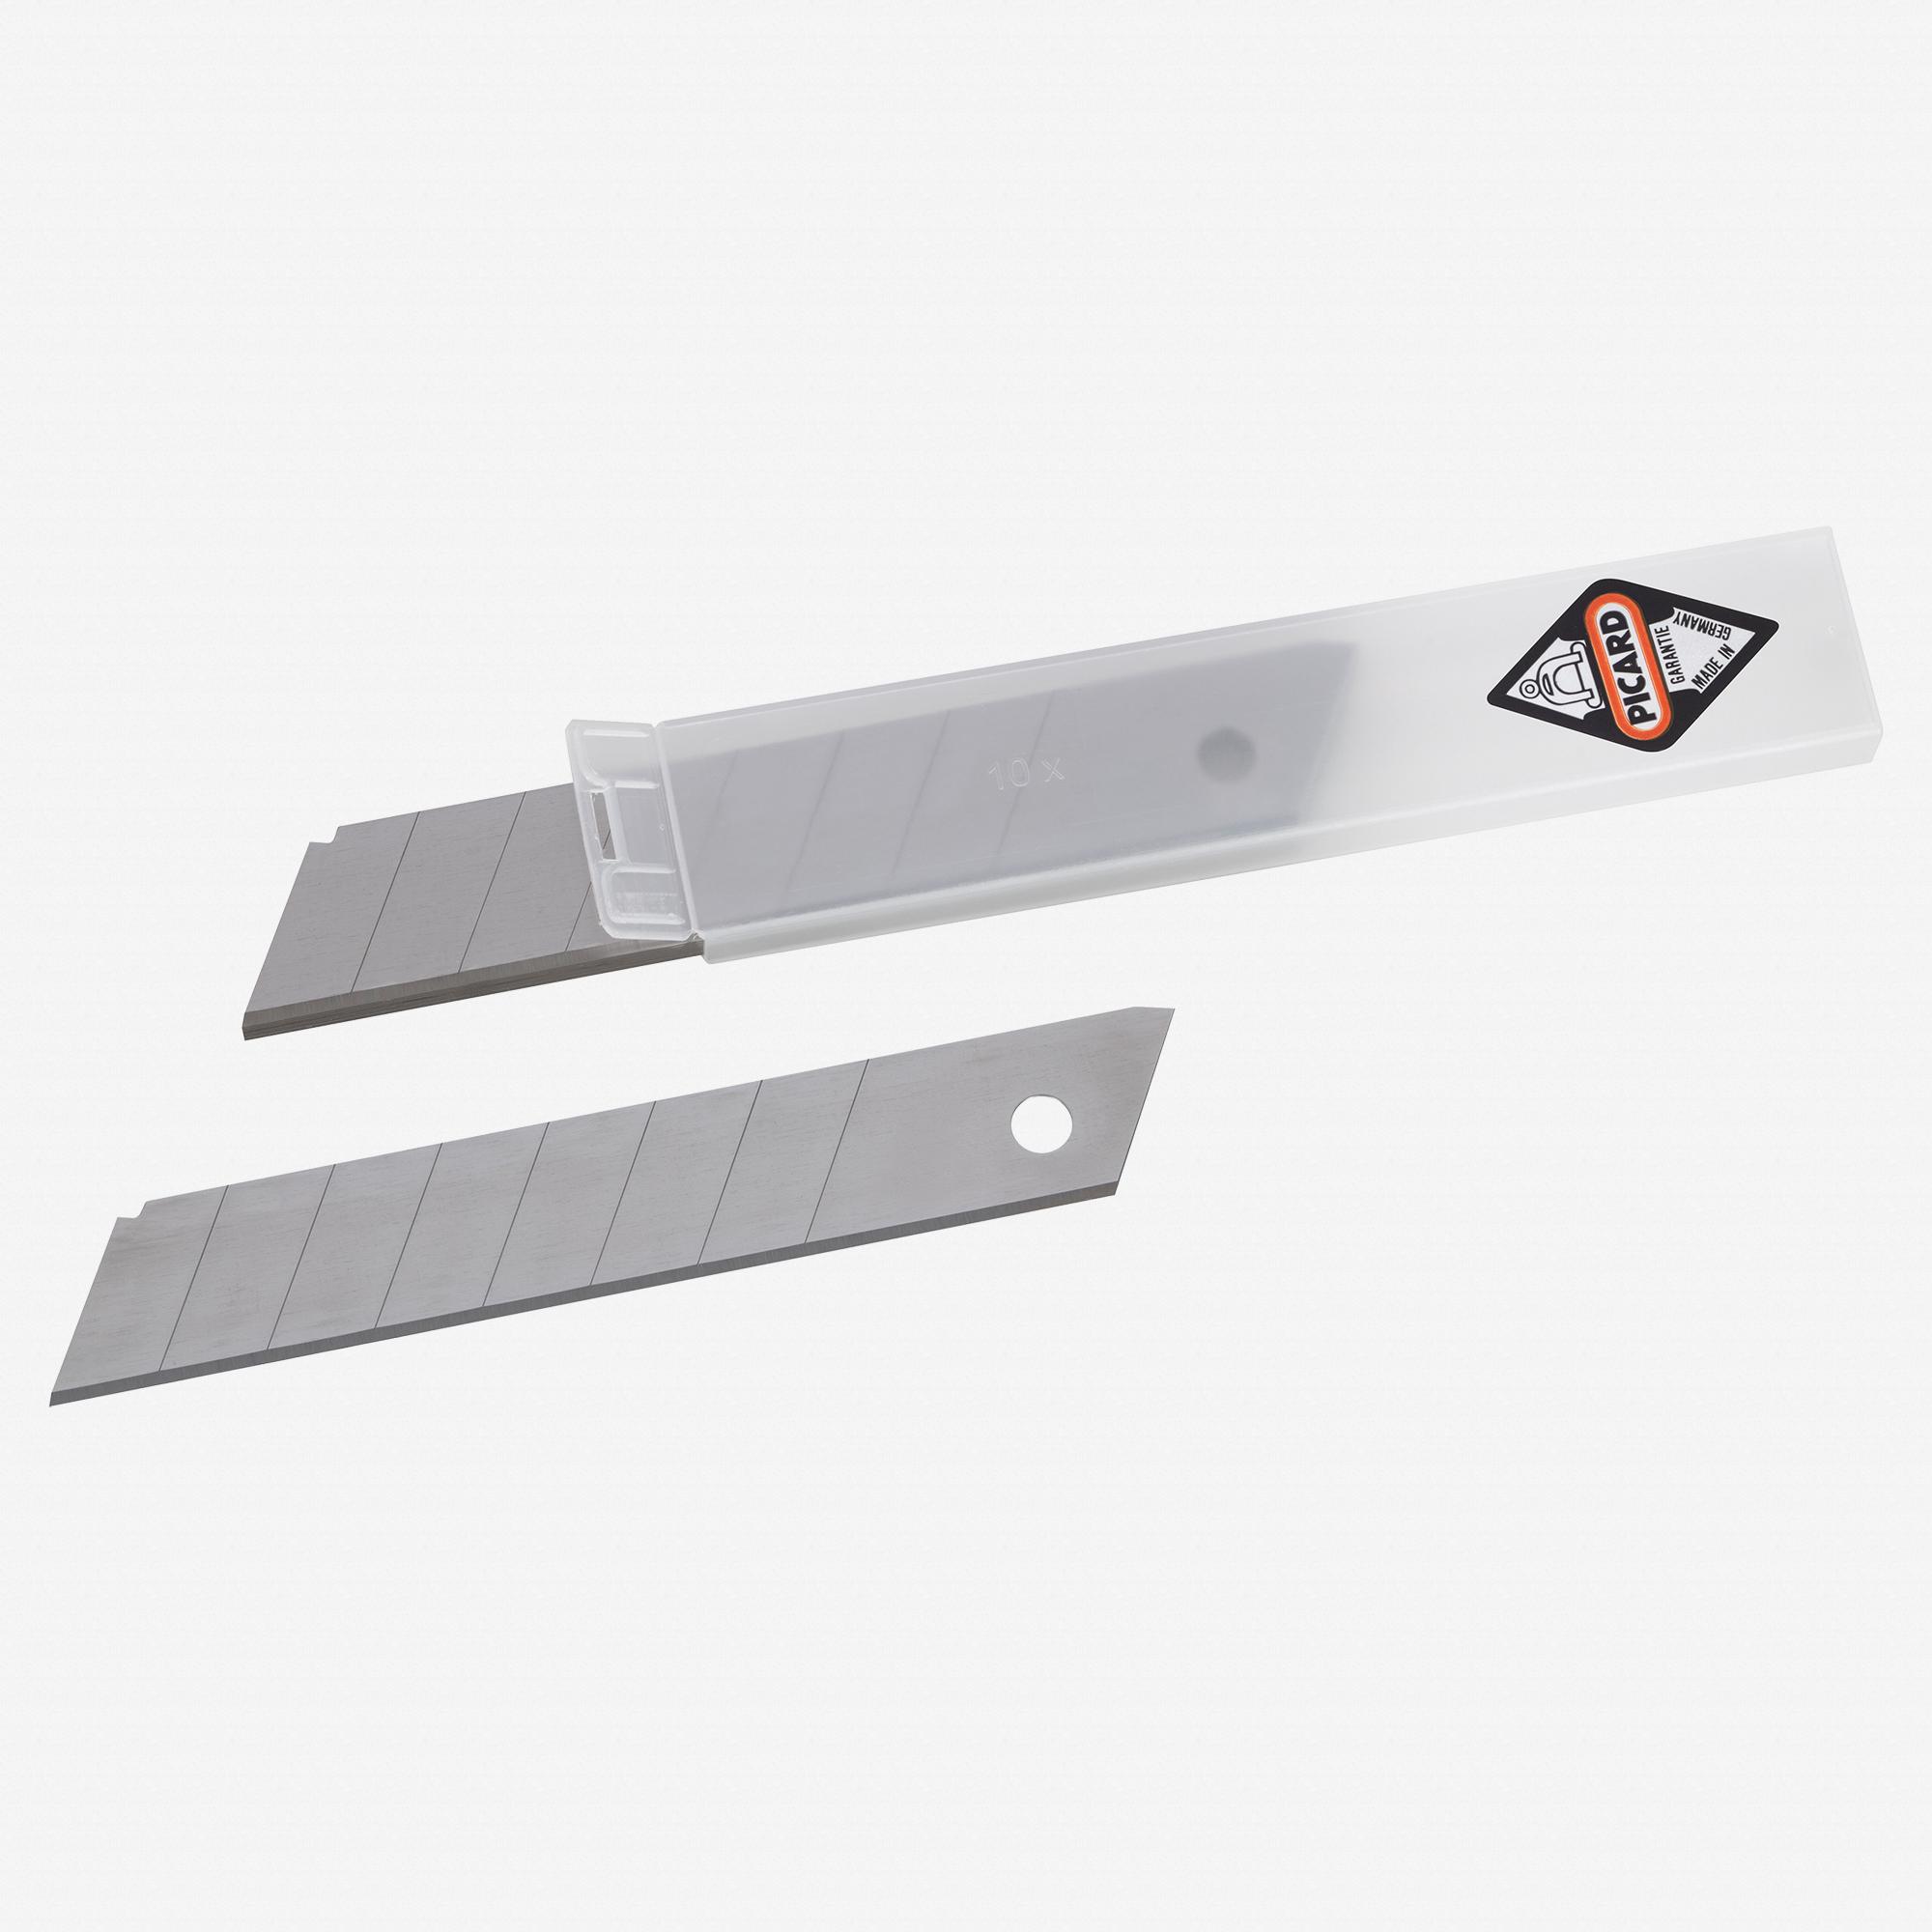 Picard 701 Break-Away Blade - KC Tool